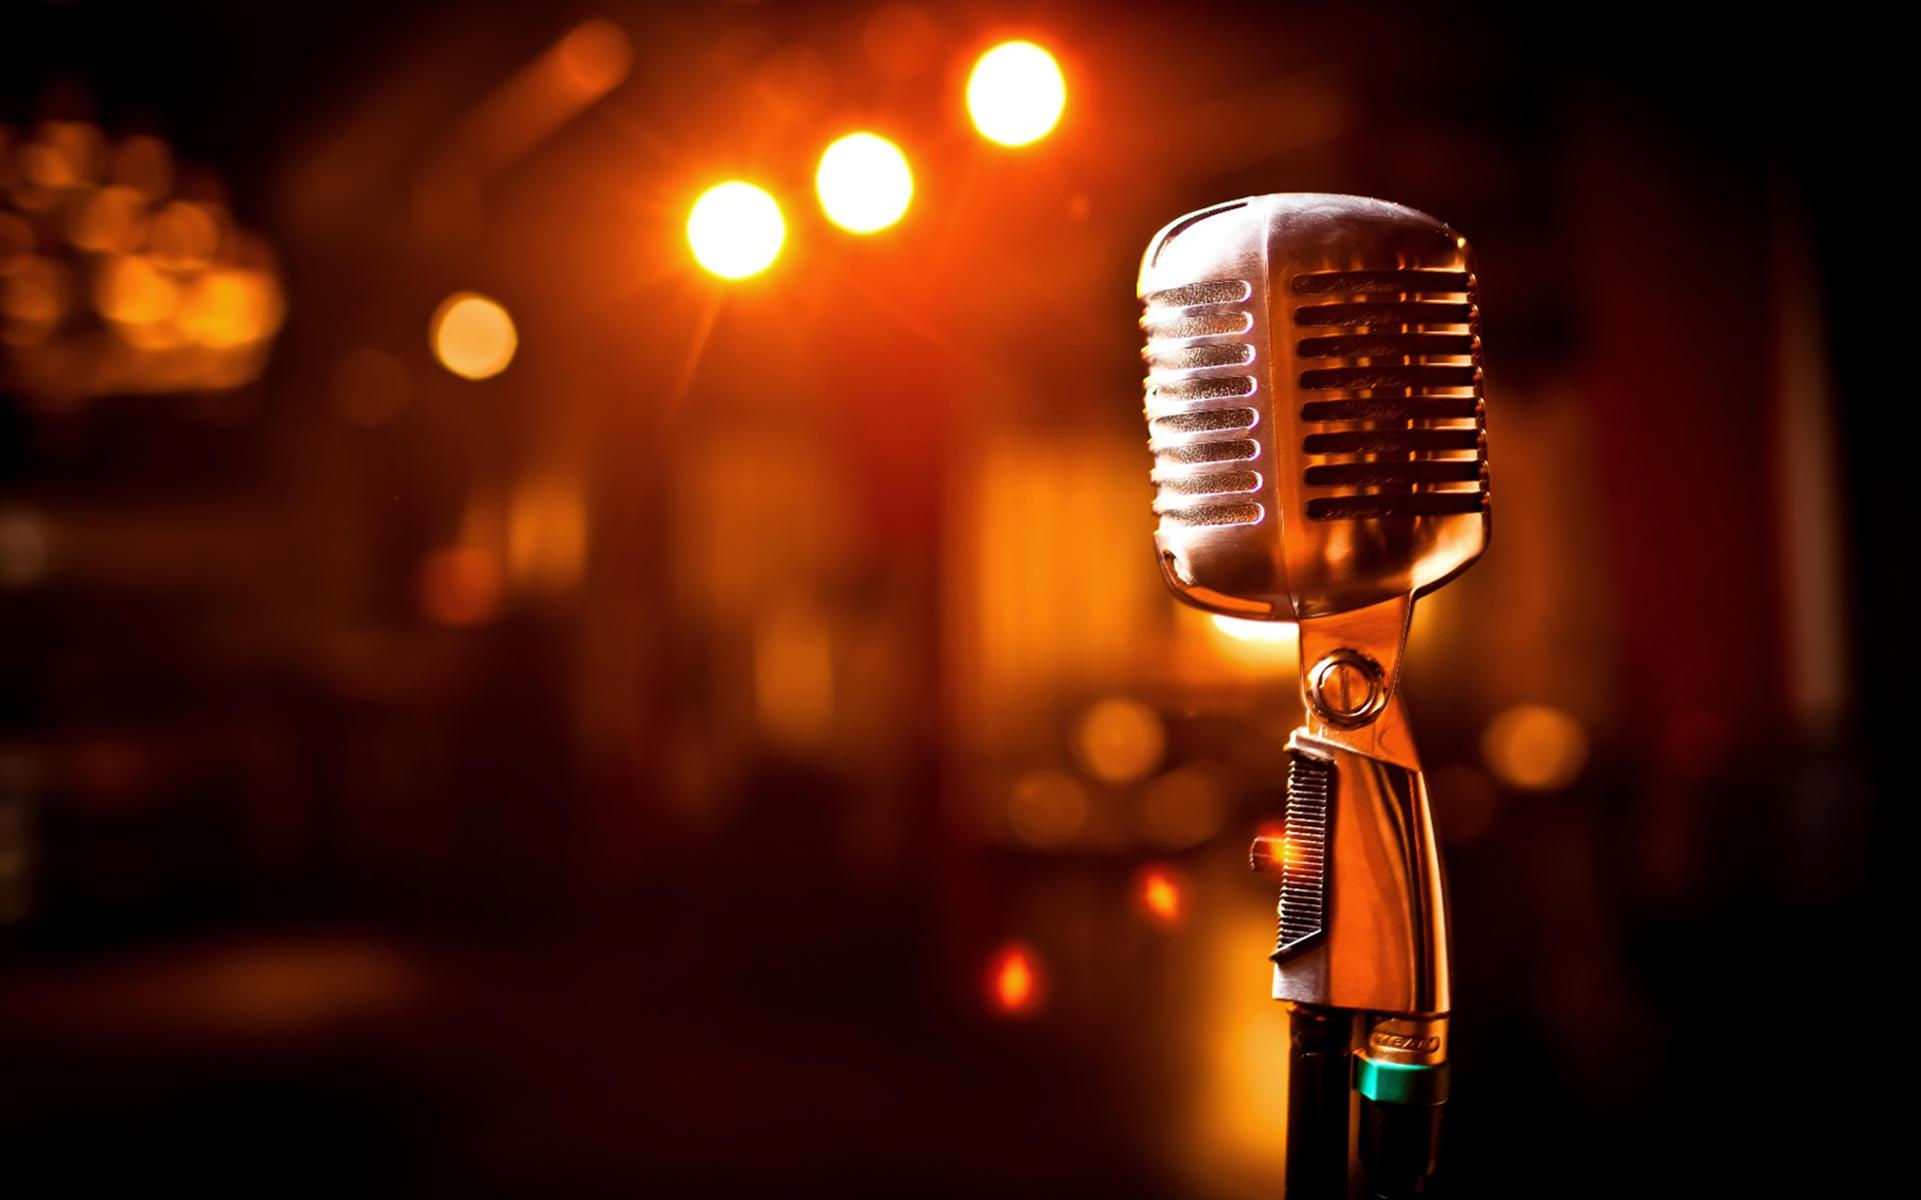 Open Mic, Street Performer, Gigs, Music Blog, Music Reviews,